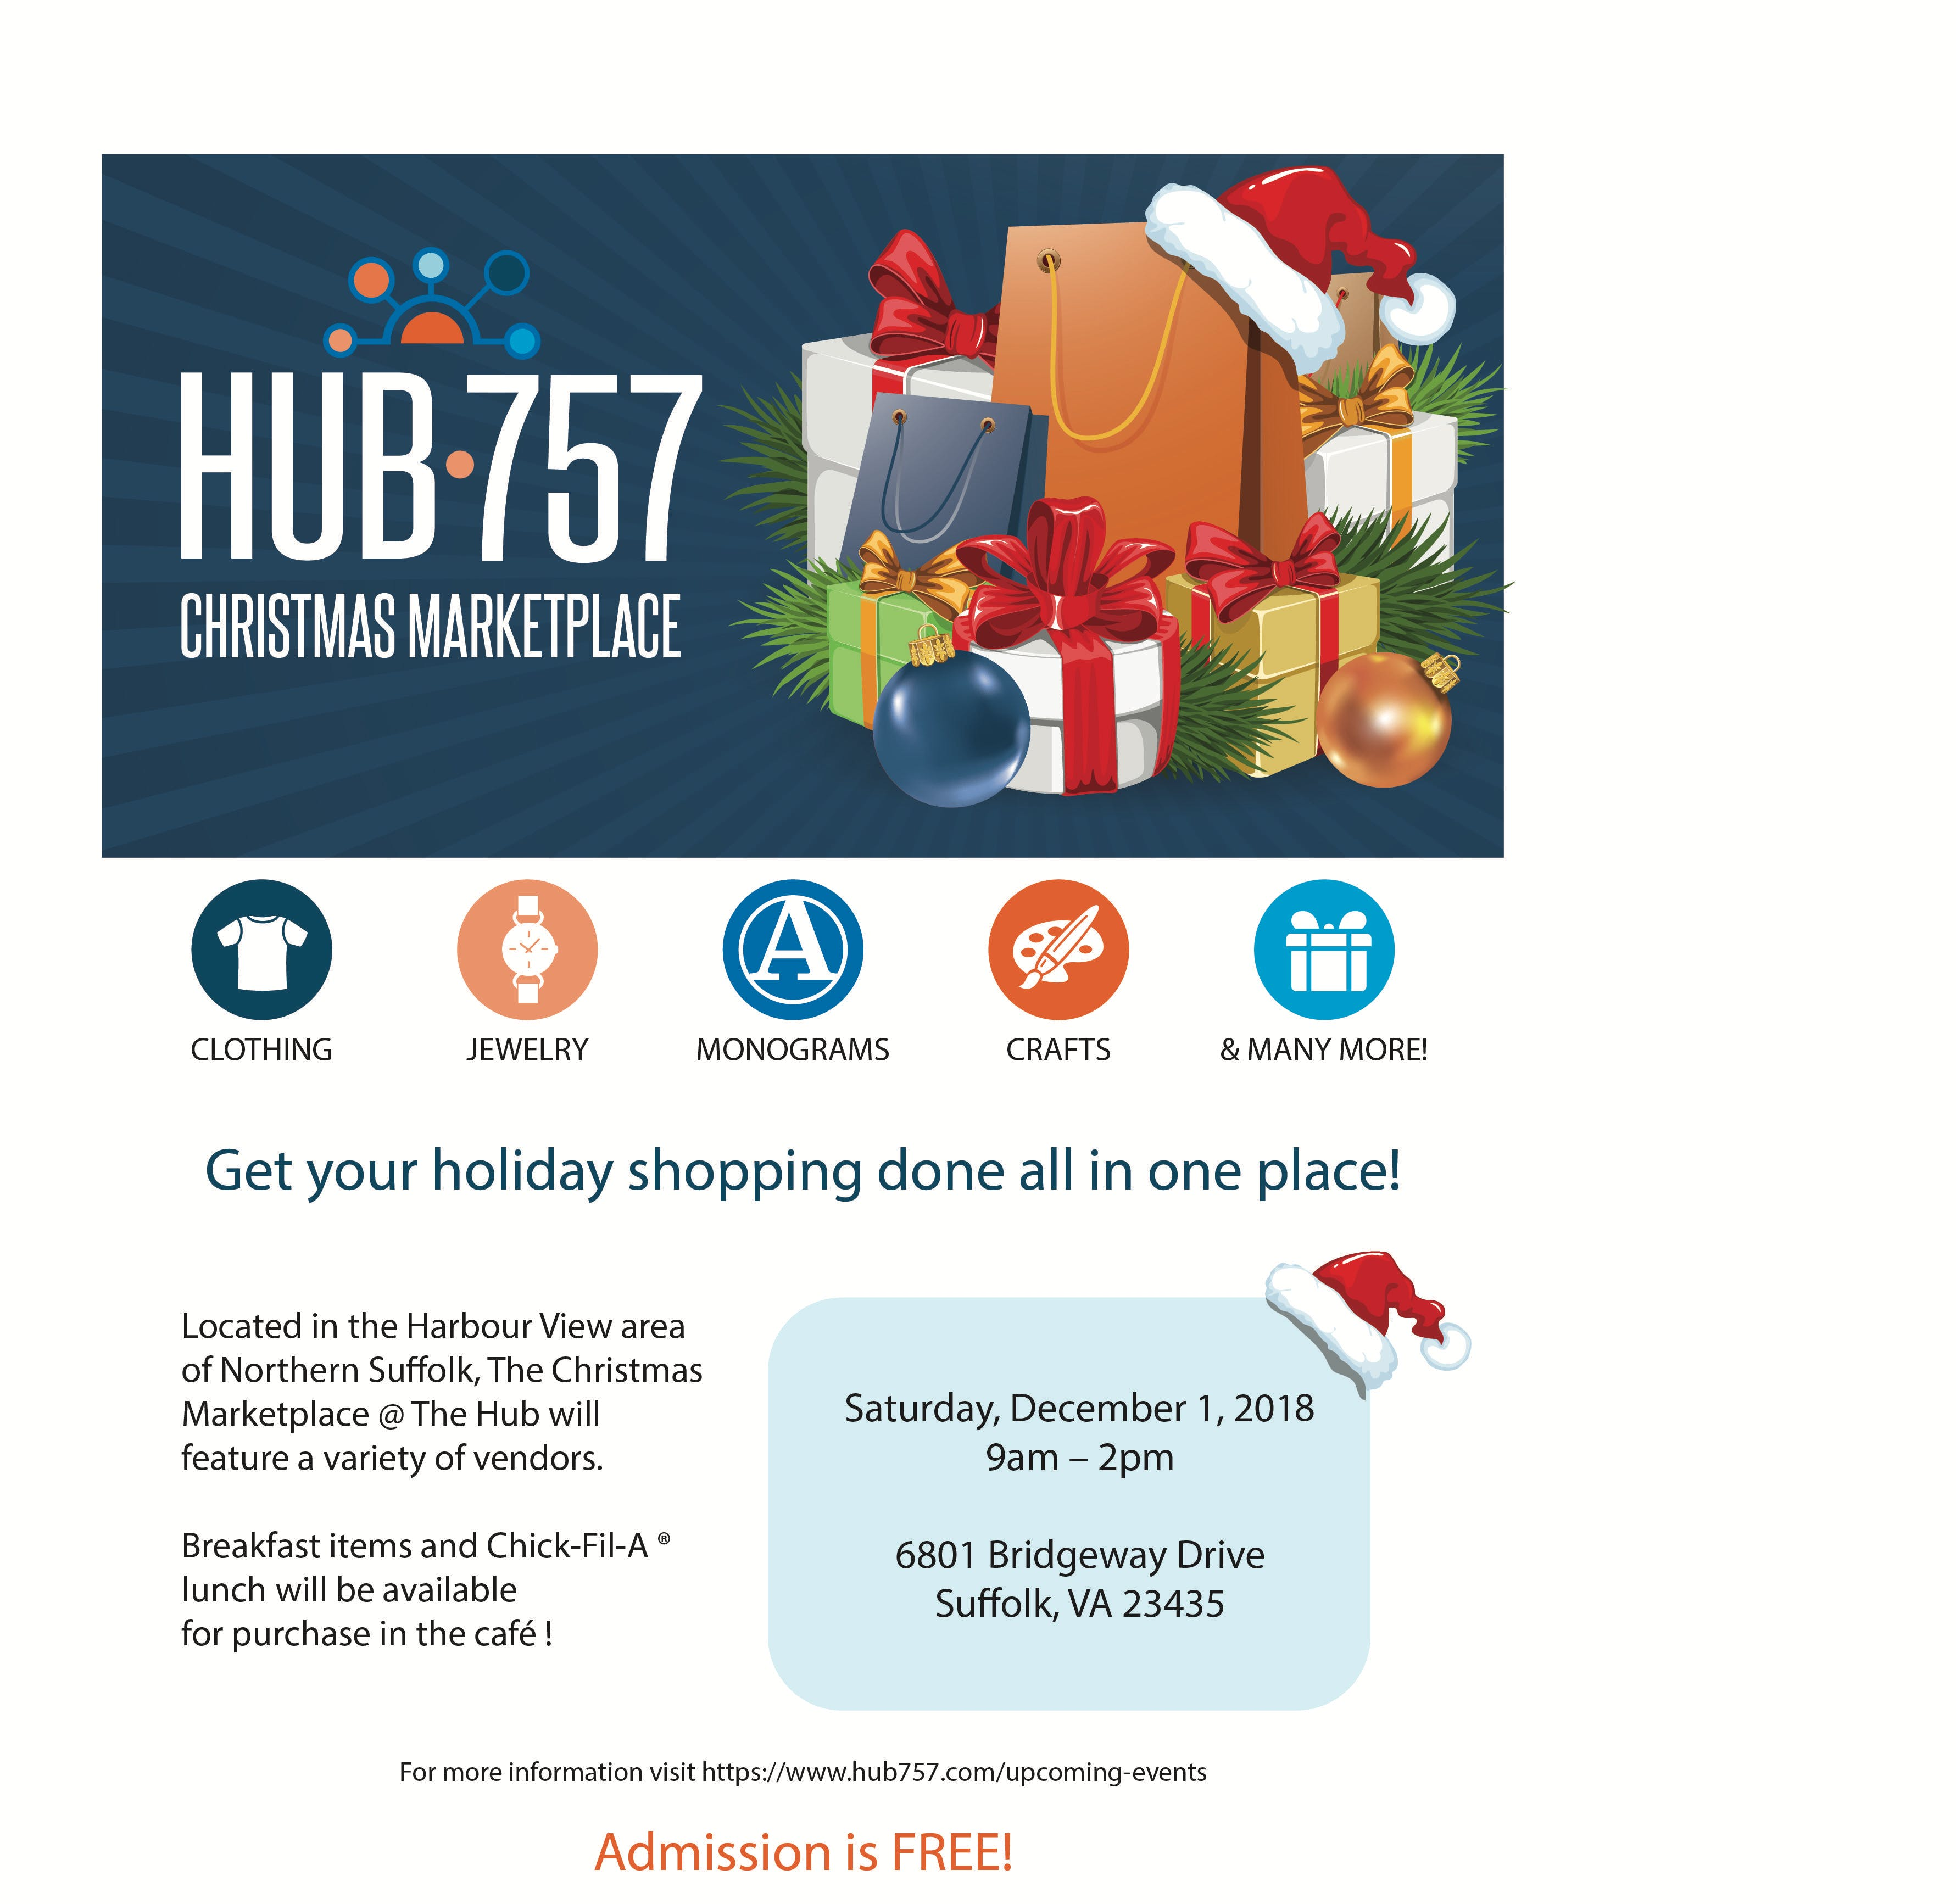 Christmas Marketplace @ The Hub - 1 DEC 2018